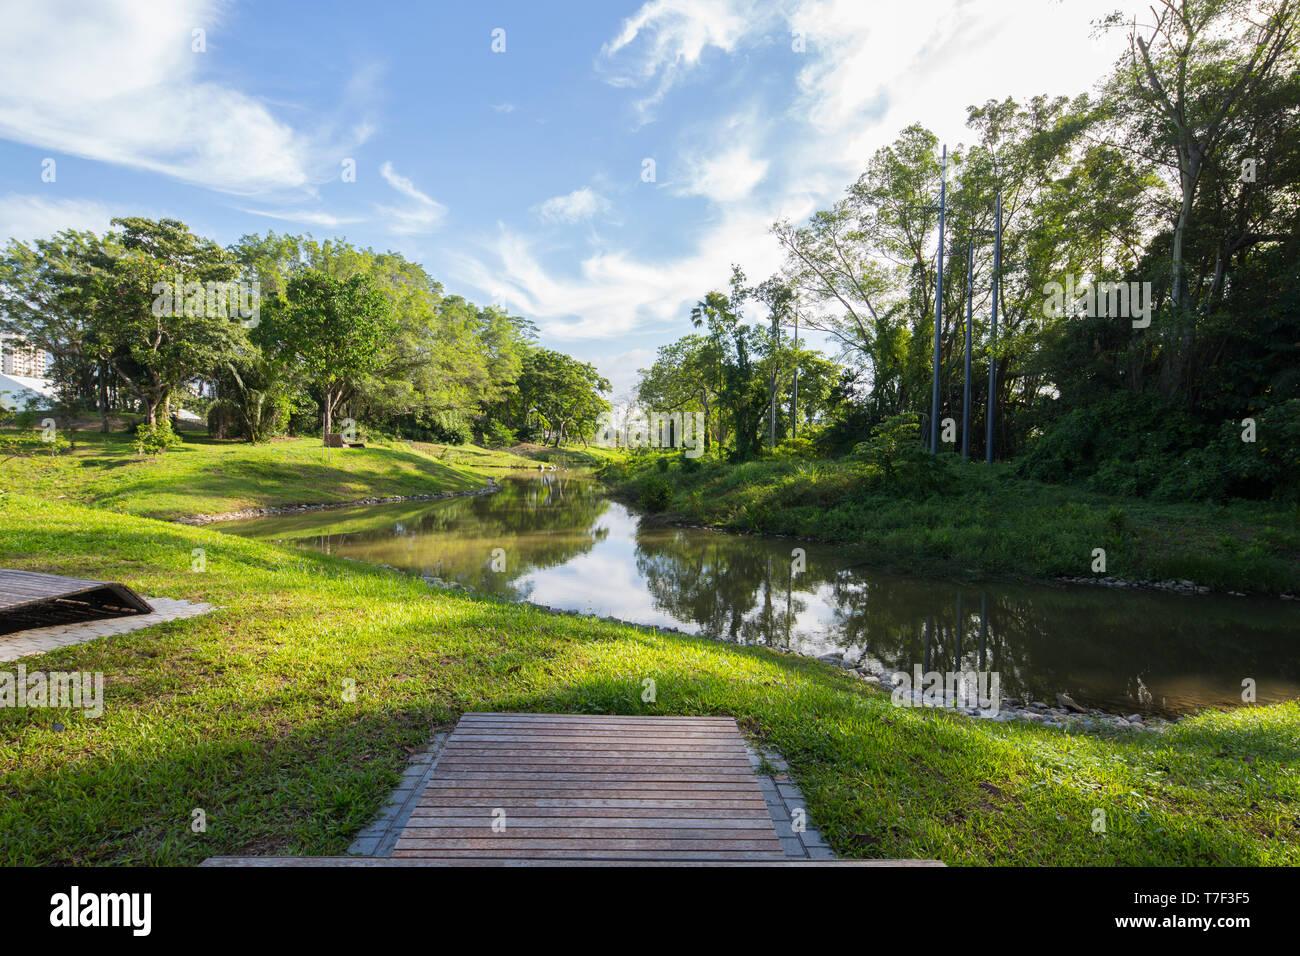 jurong-lake-gardens-T7F3F5.jpg